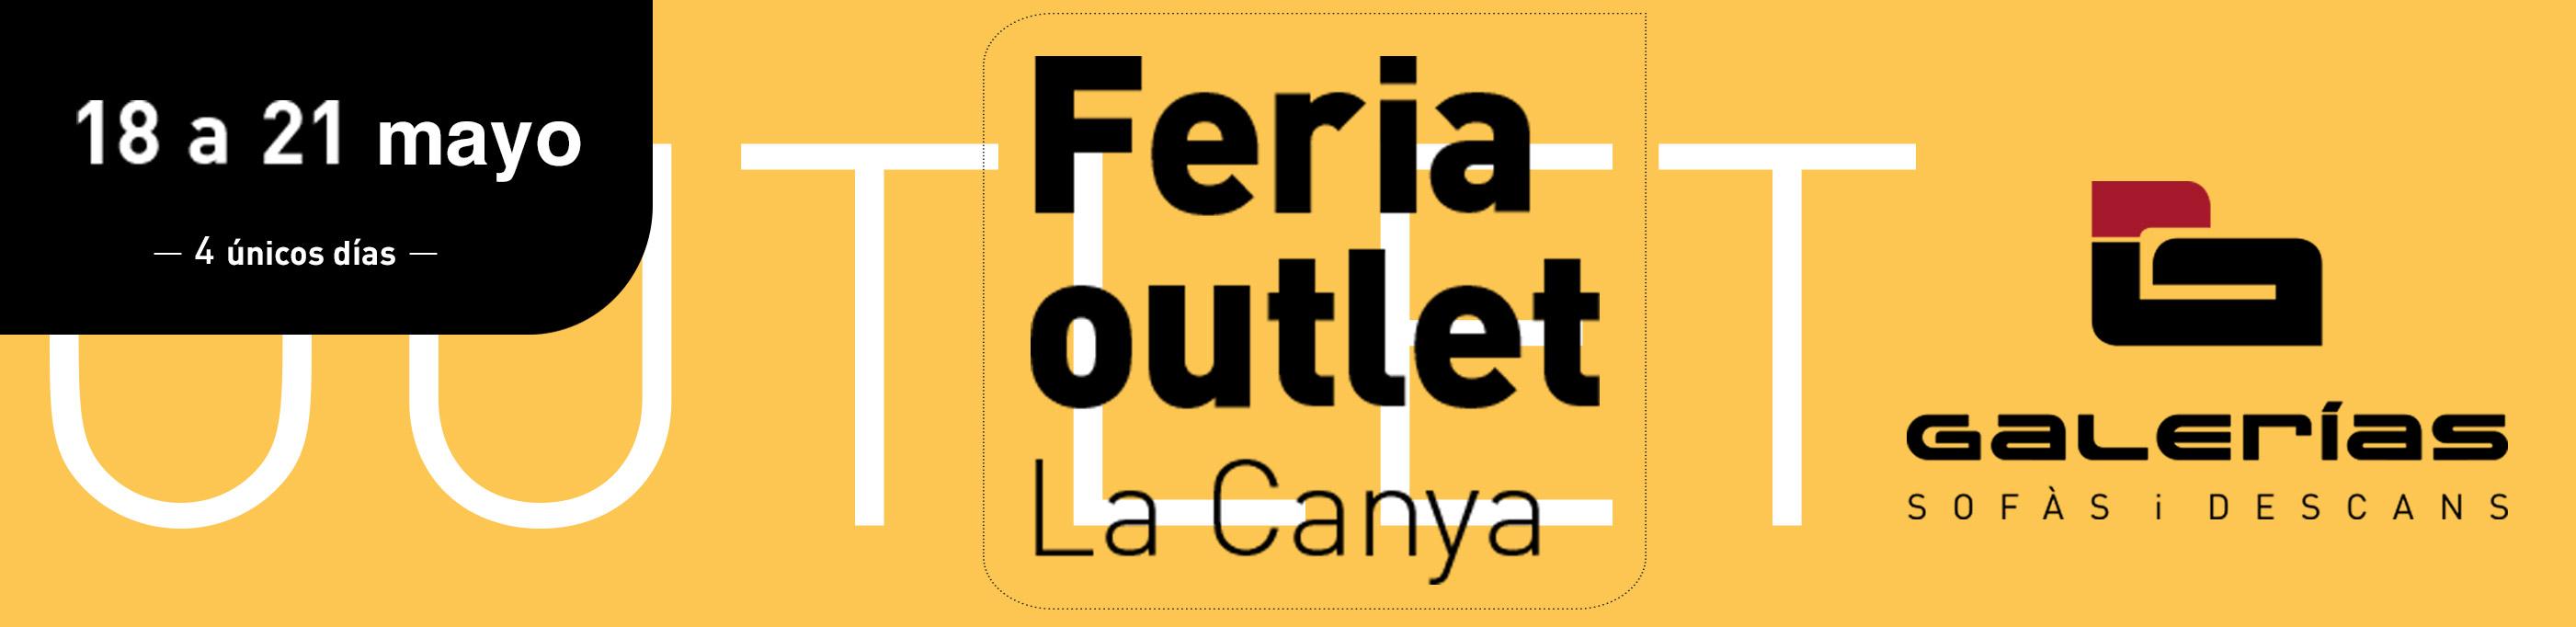 imatge-blog-Outlet-La-Canya-castellà